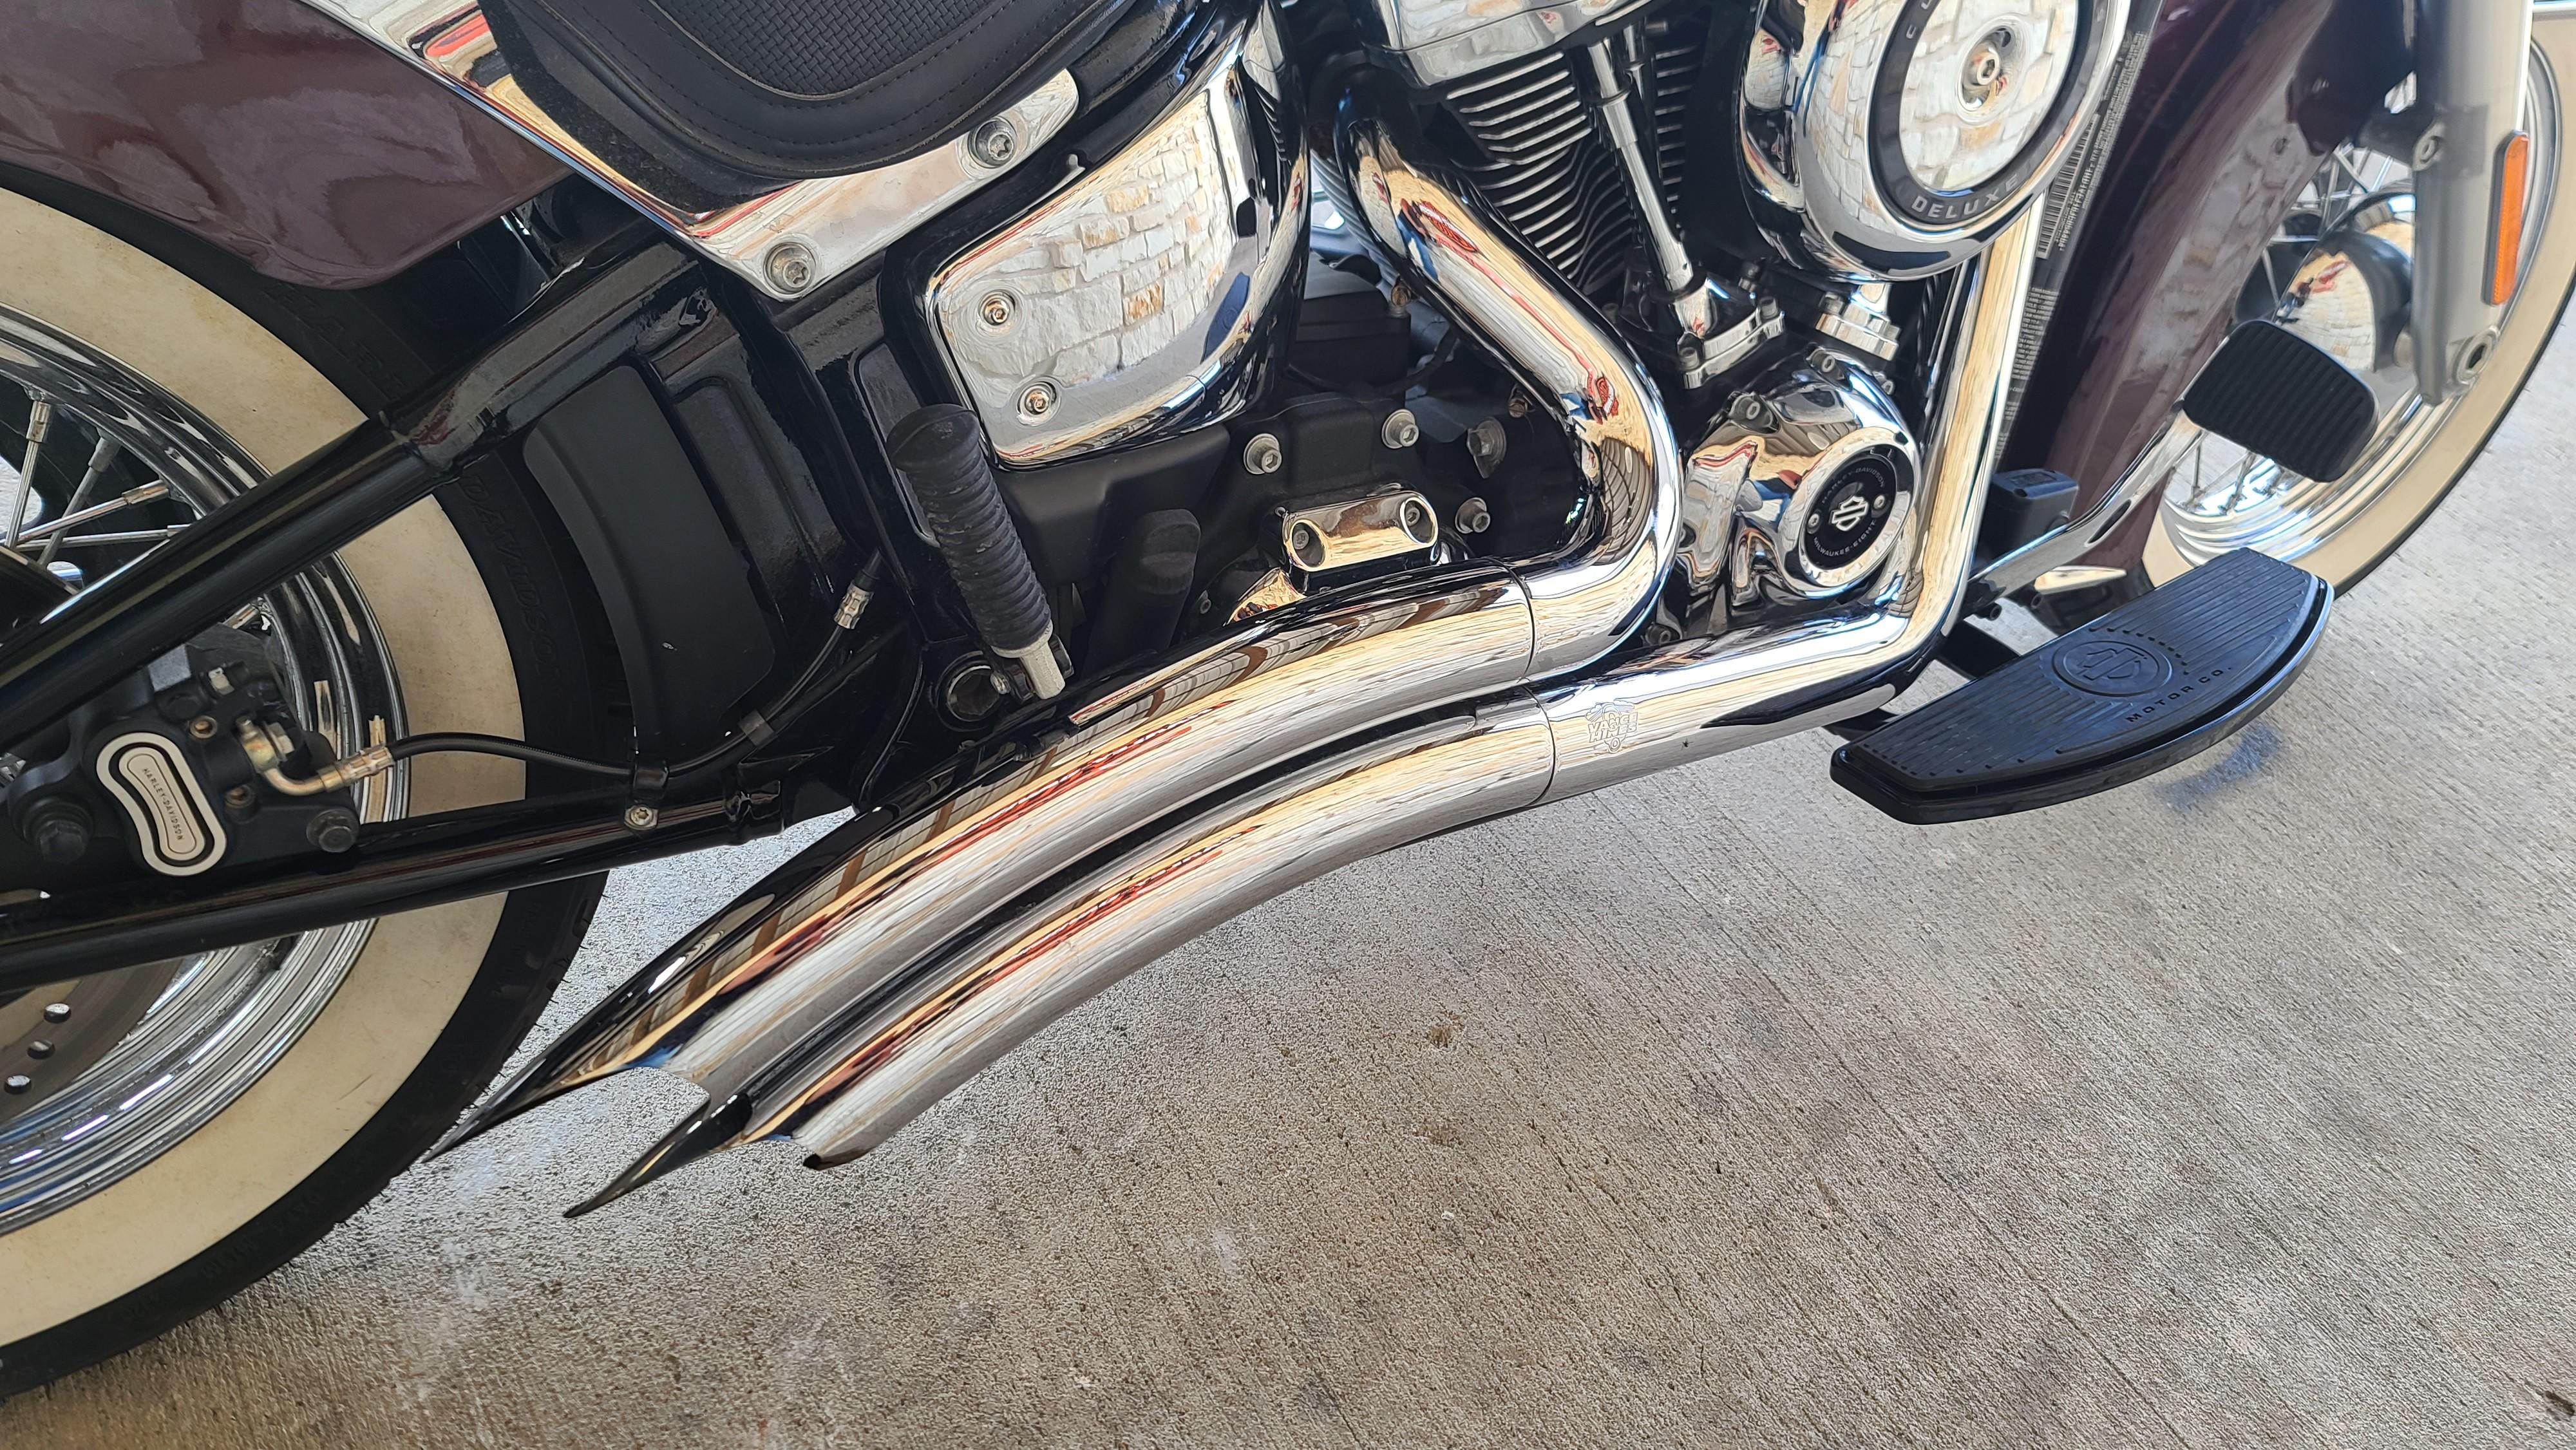 2018 Harley-Davidson Softail Deluxe at Harley-Davidson of Waco